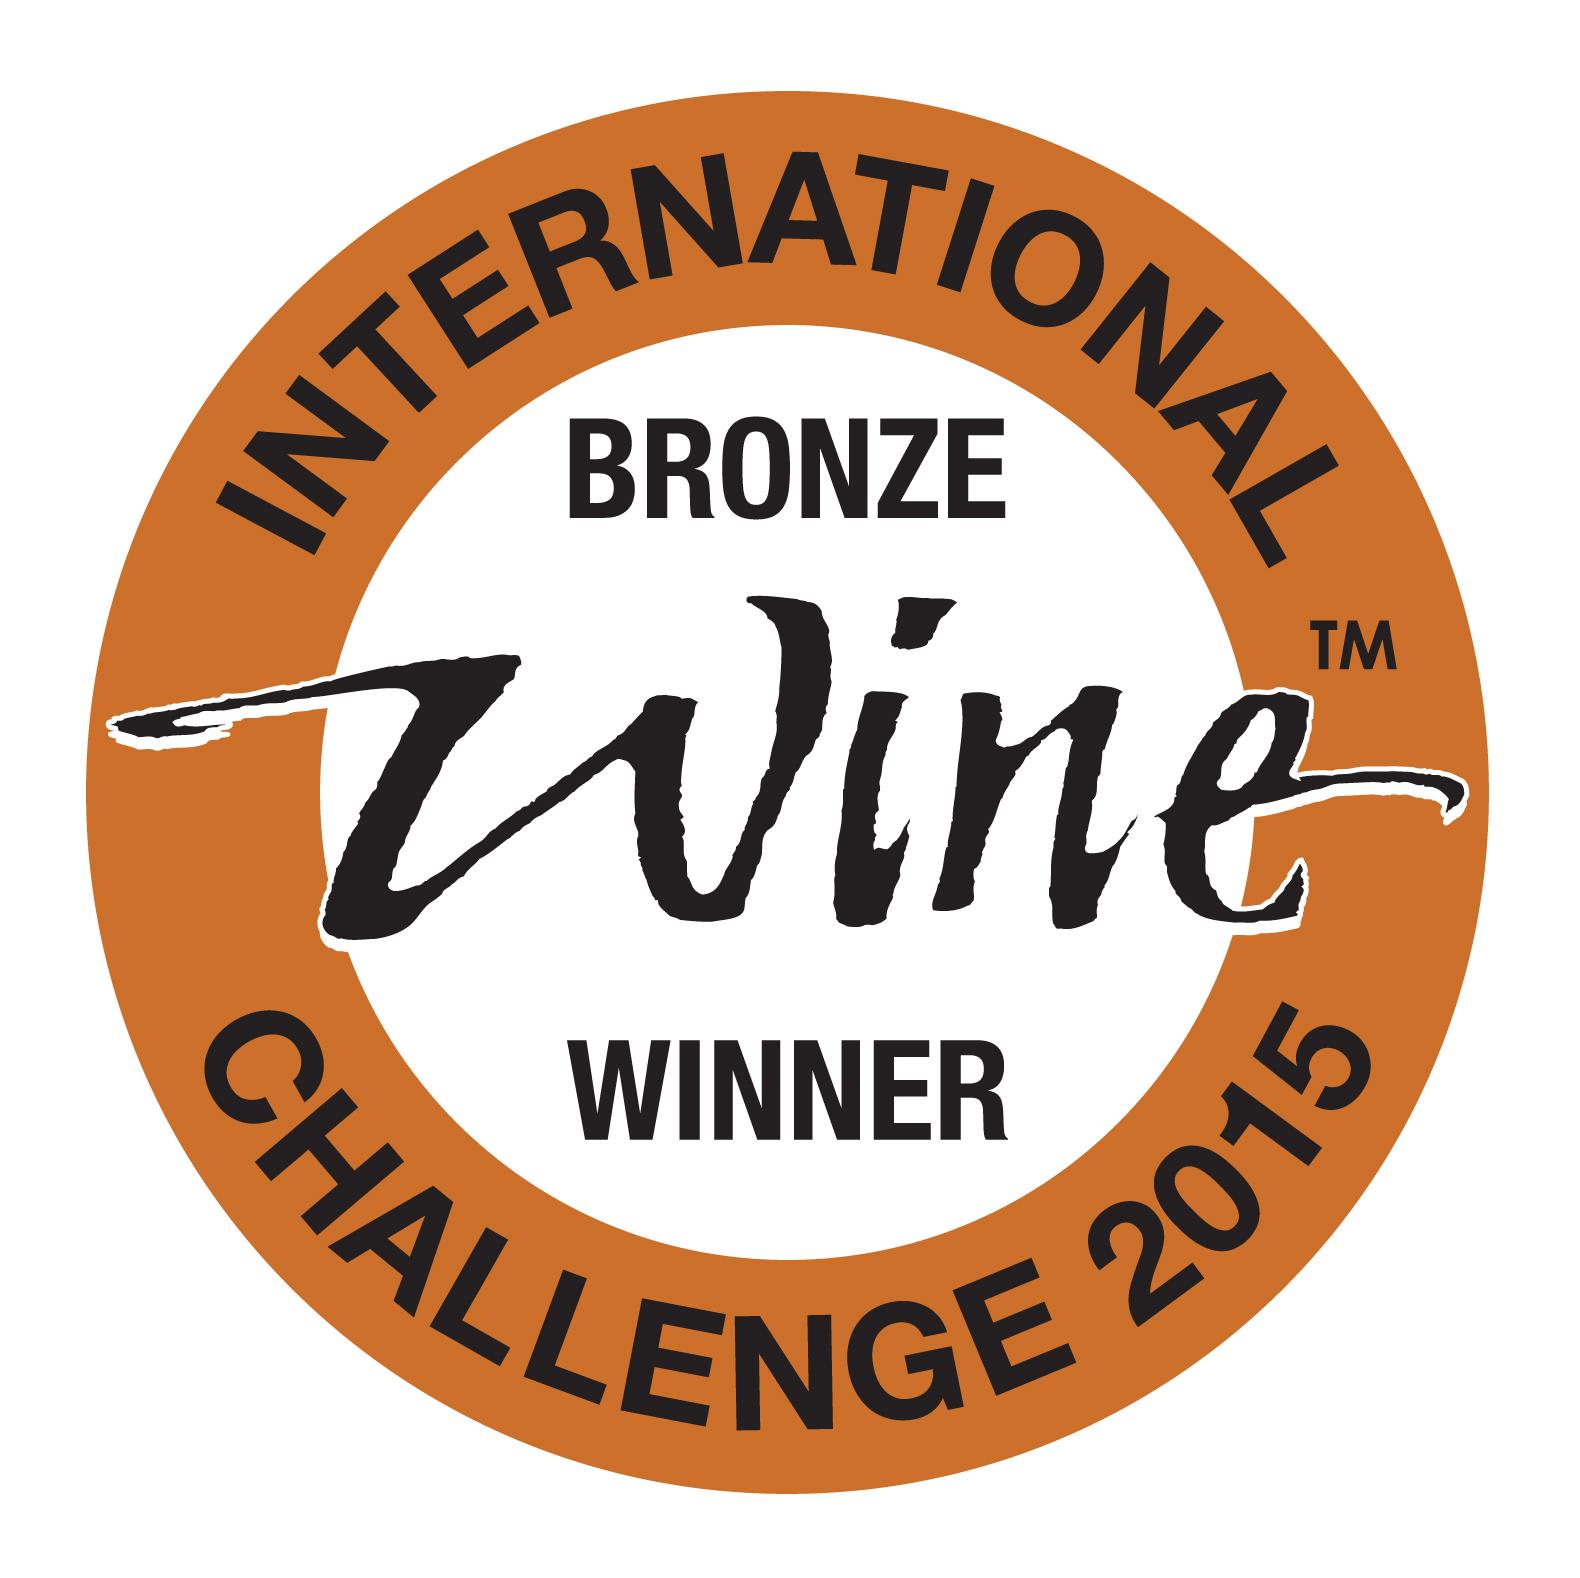 IWC Bronze Award 2015